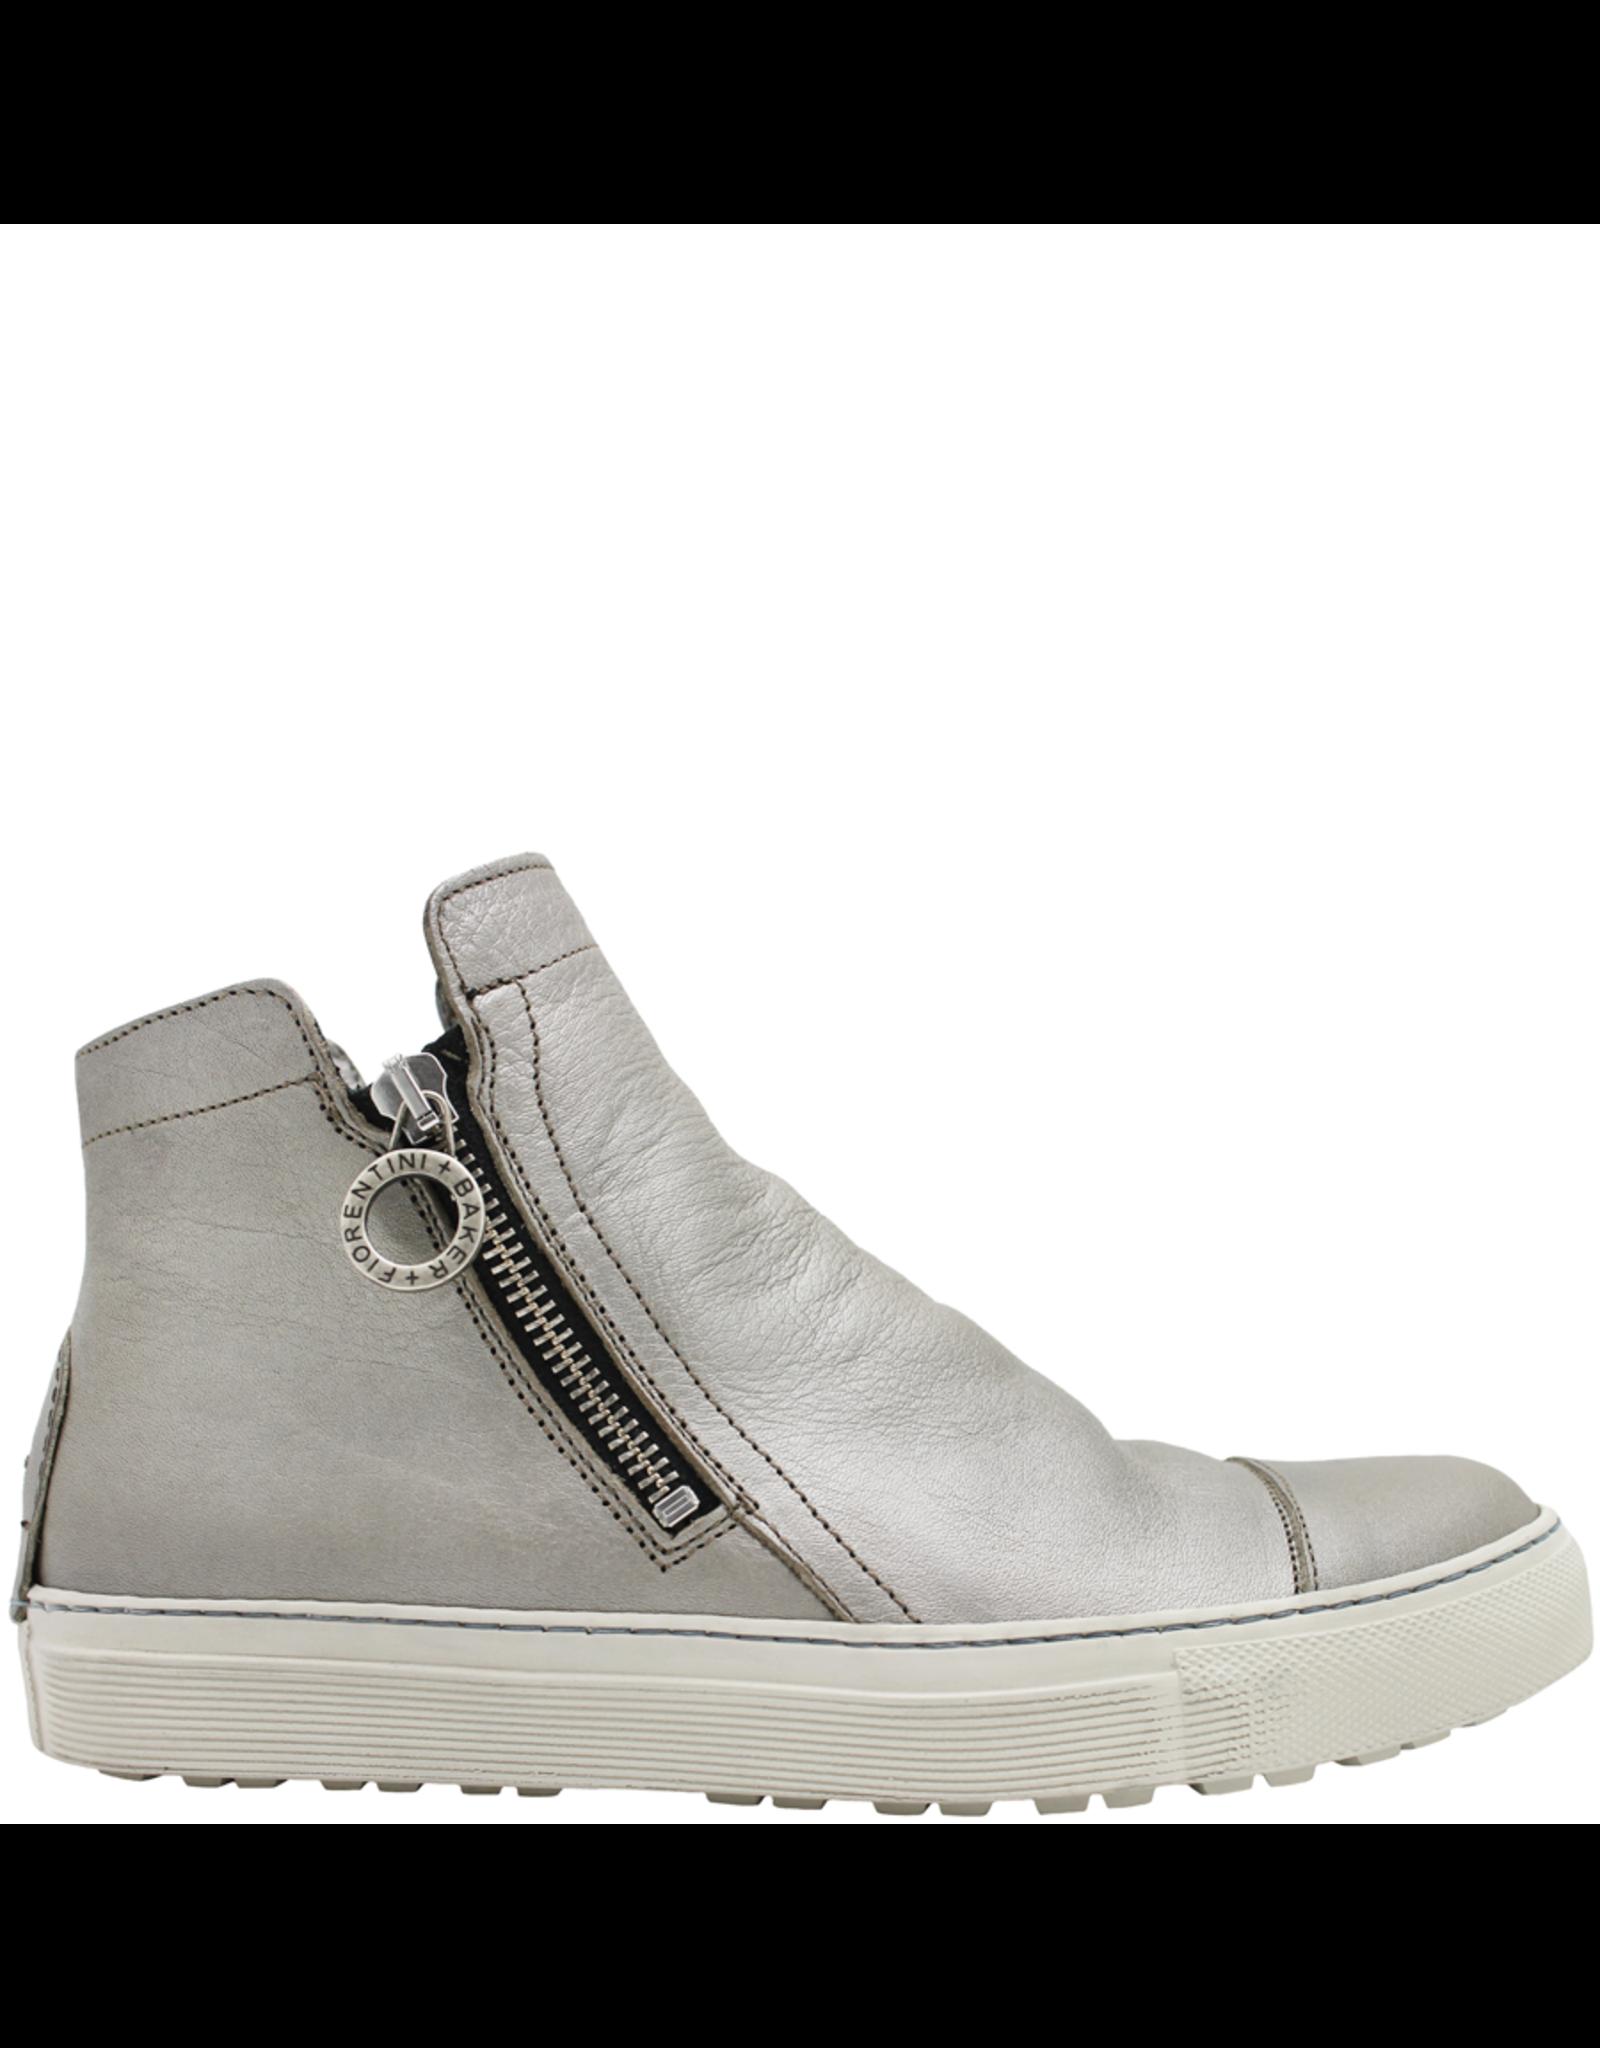 Fiorentini+Baker Fiorentini+Baker Silver Nappa 2-Zipper Sneaker Babet